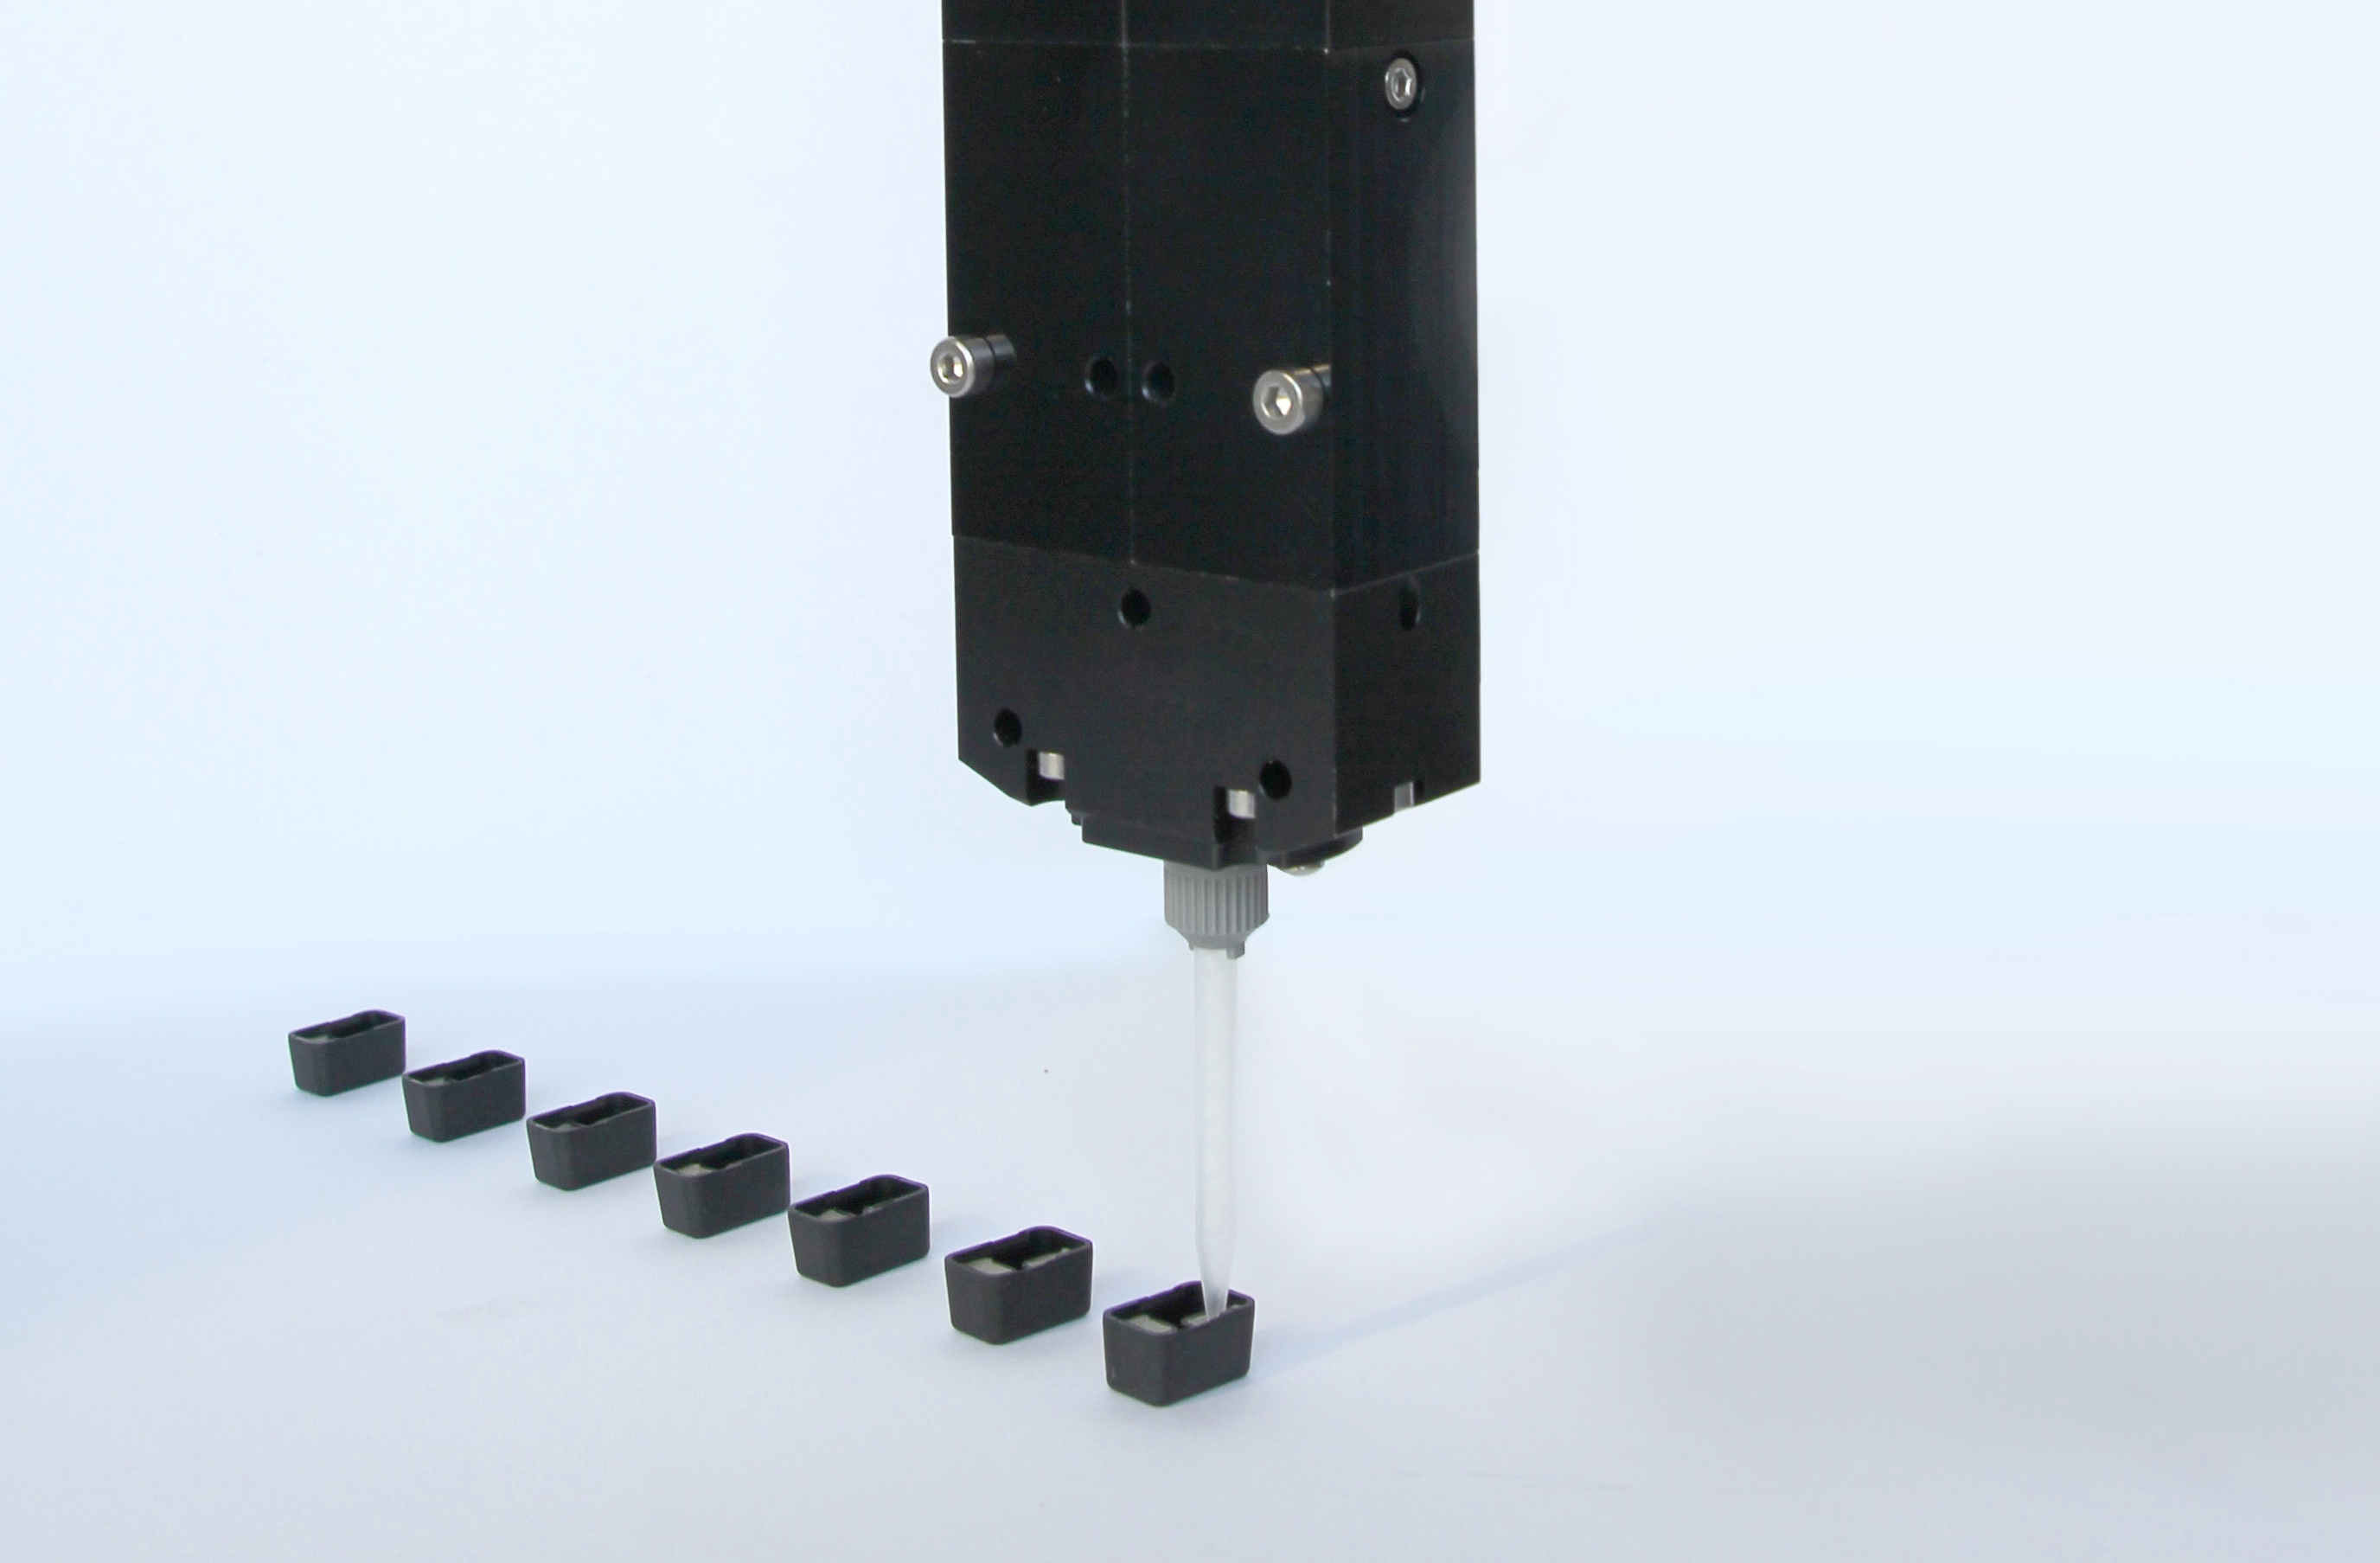 Dispenser Visco-Duo-P 4/4 in a potting application. (Picture: Viscotec)